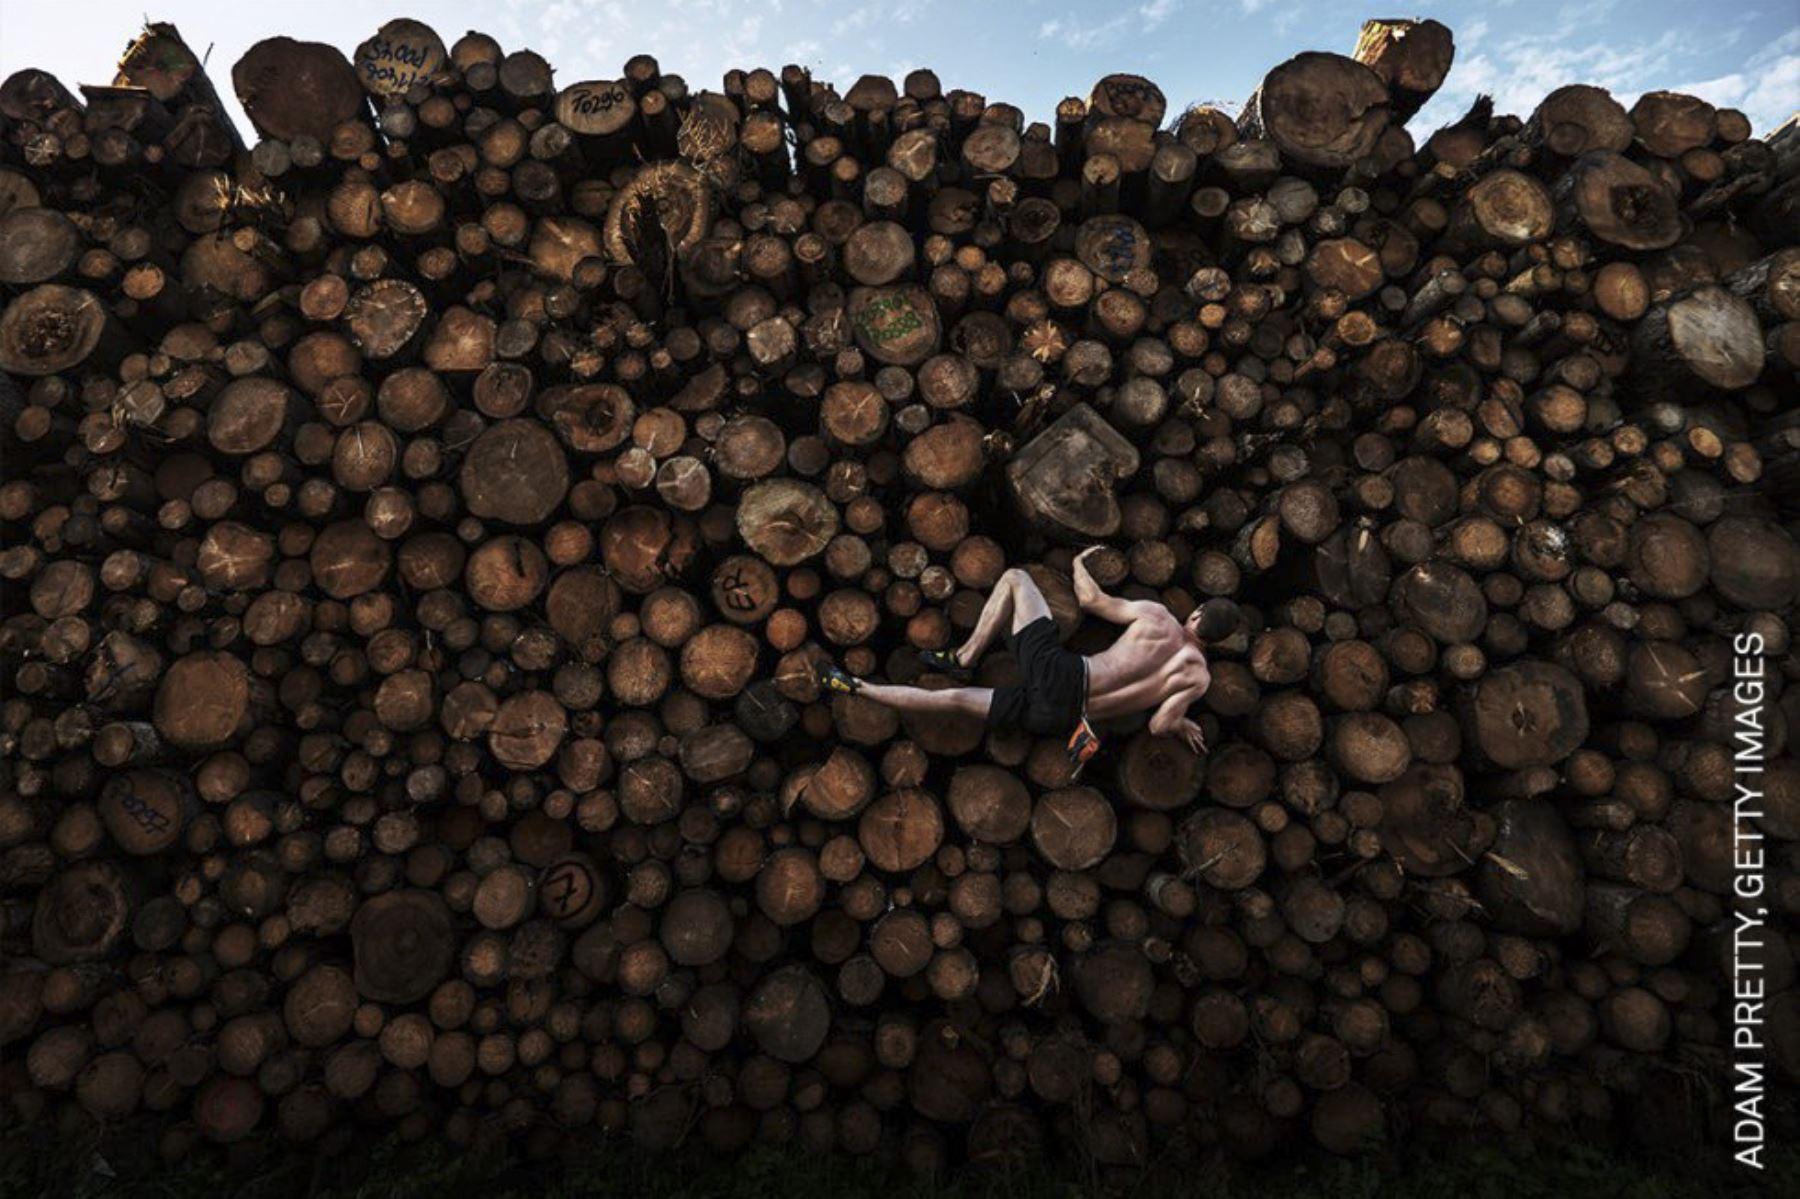 Deporte, individual: Escalador de troncos. Foto: Adam Pretty